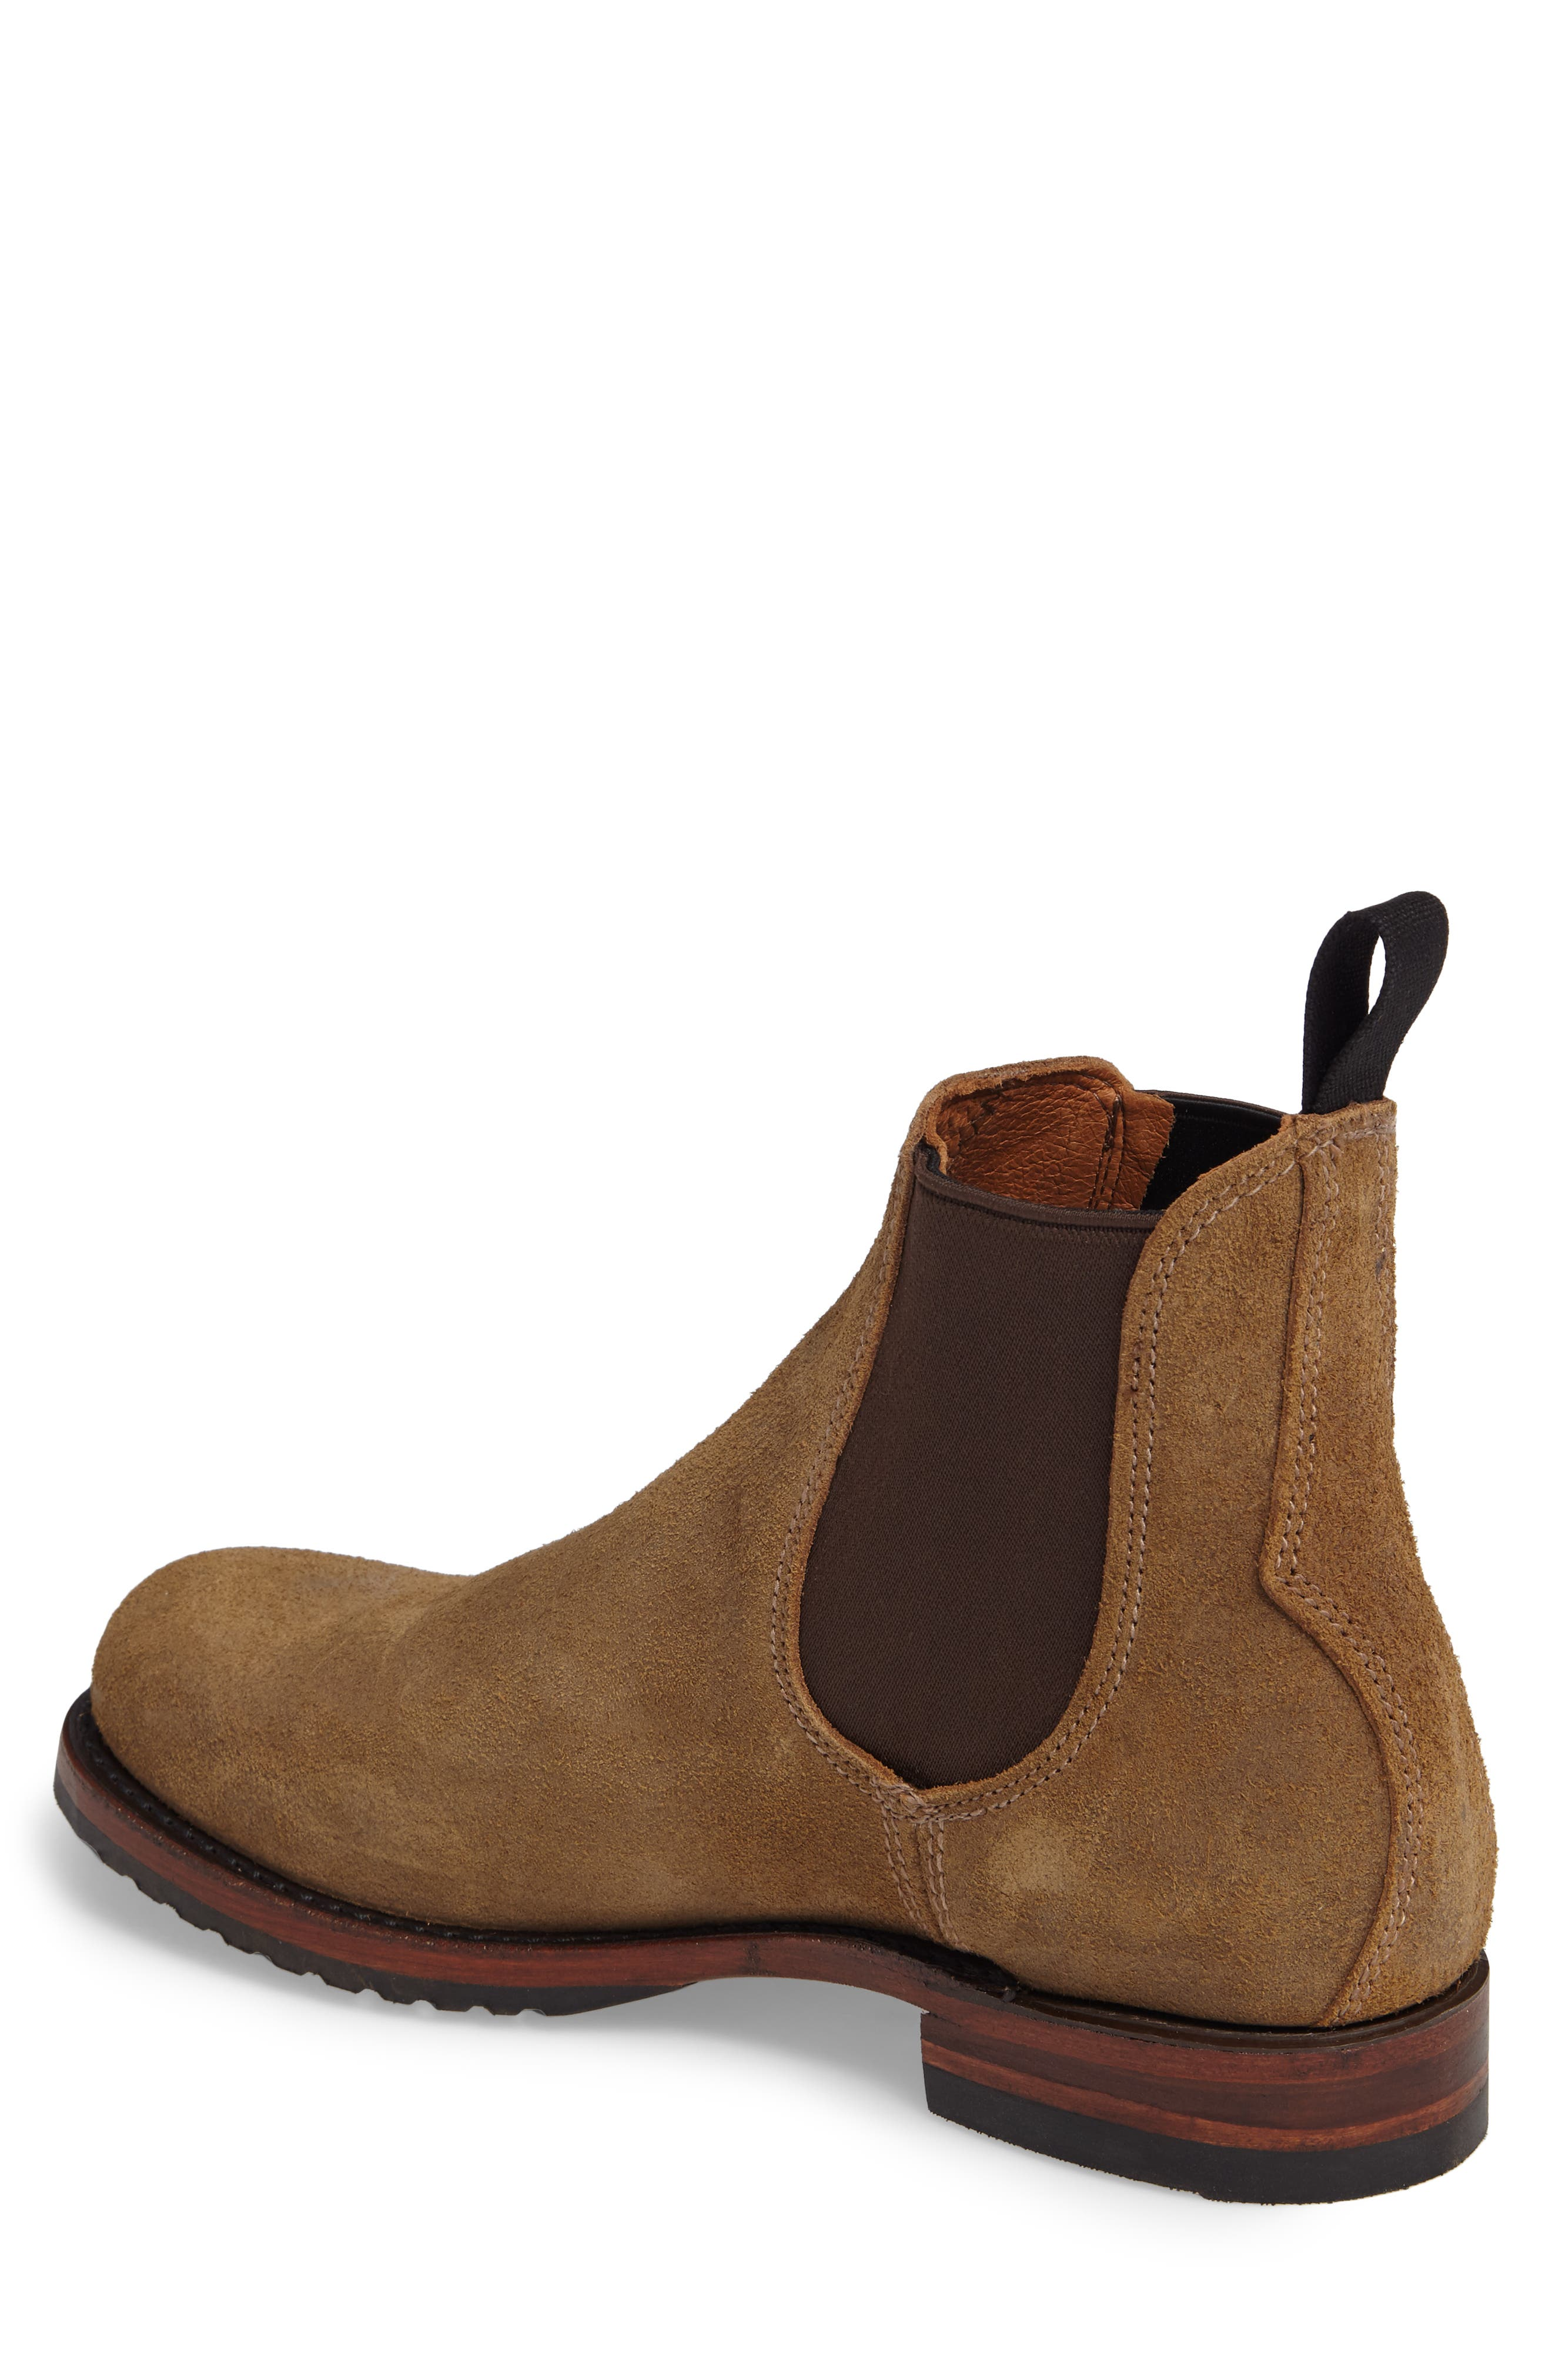 Logan Chelsea Boot,                             Alternate thumbnail 2, color,                             215